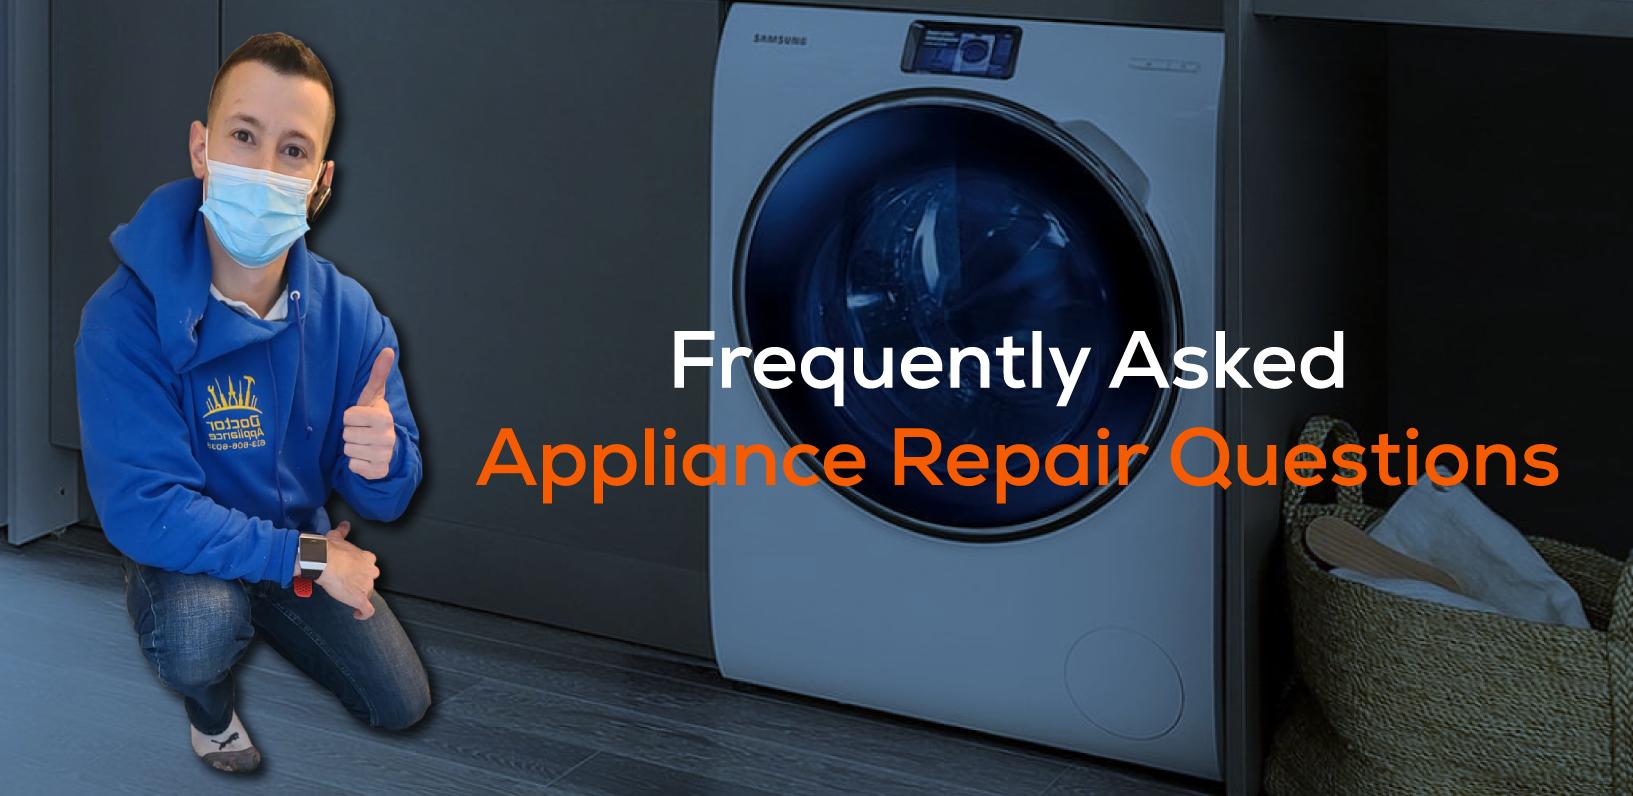 free same day appliance repair service appliance repair questions